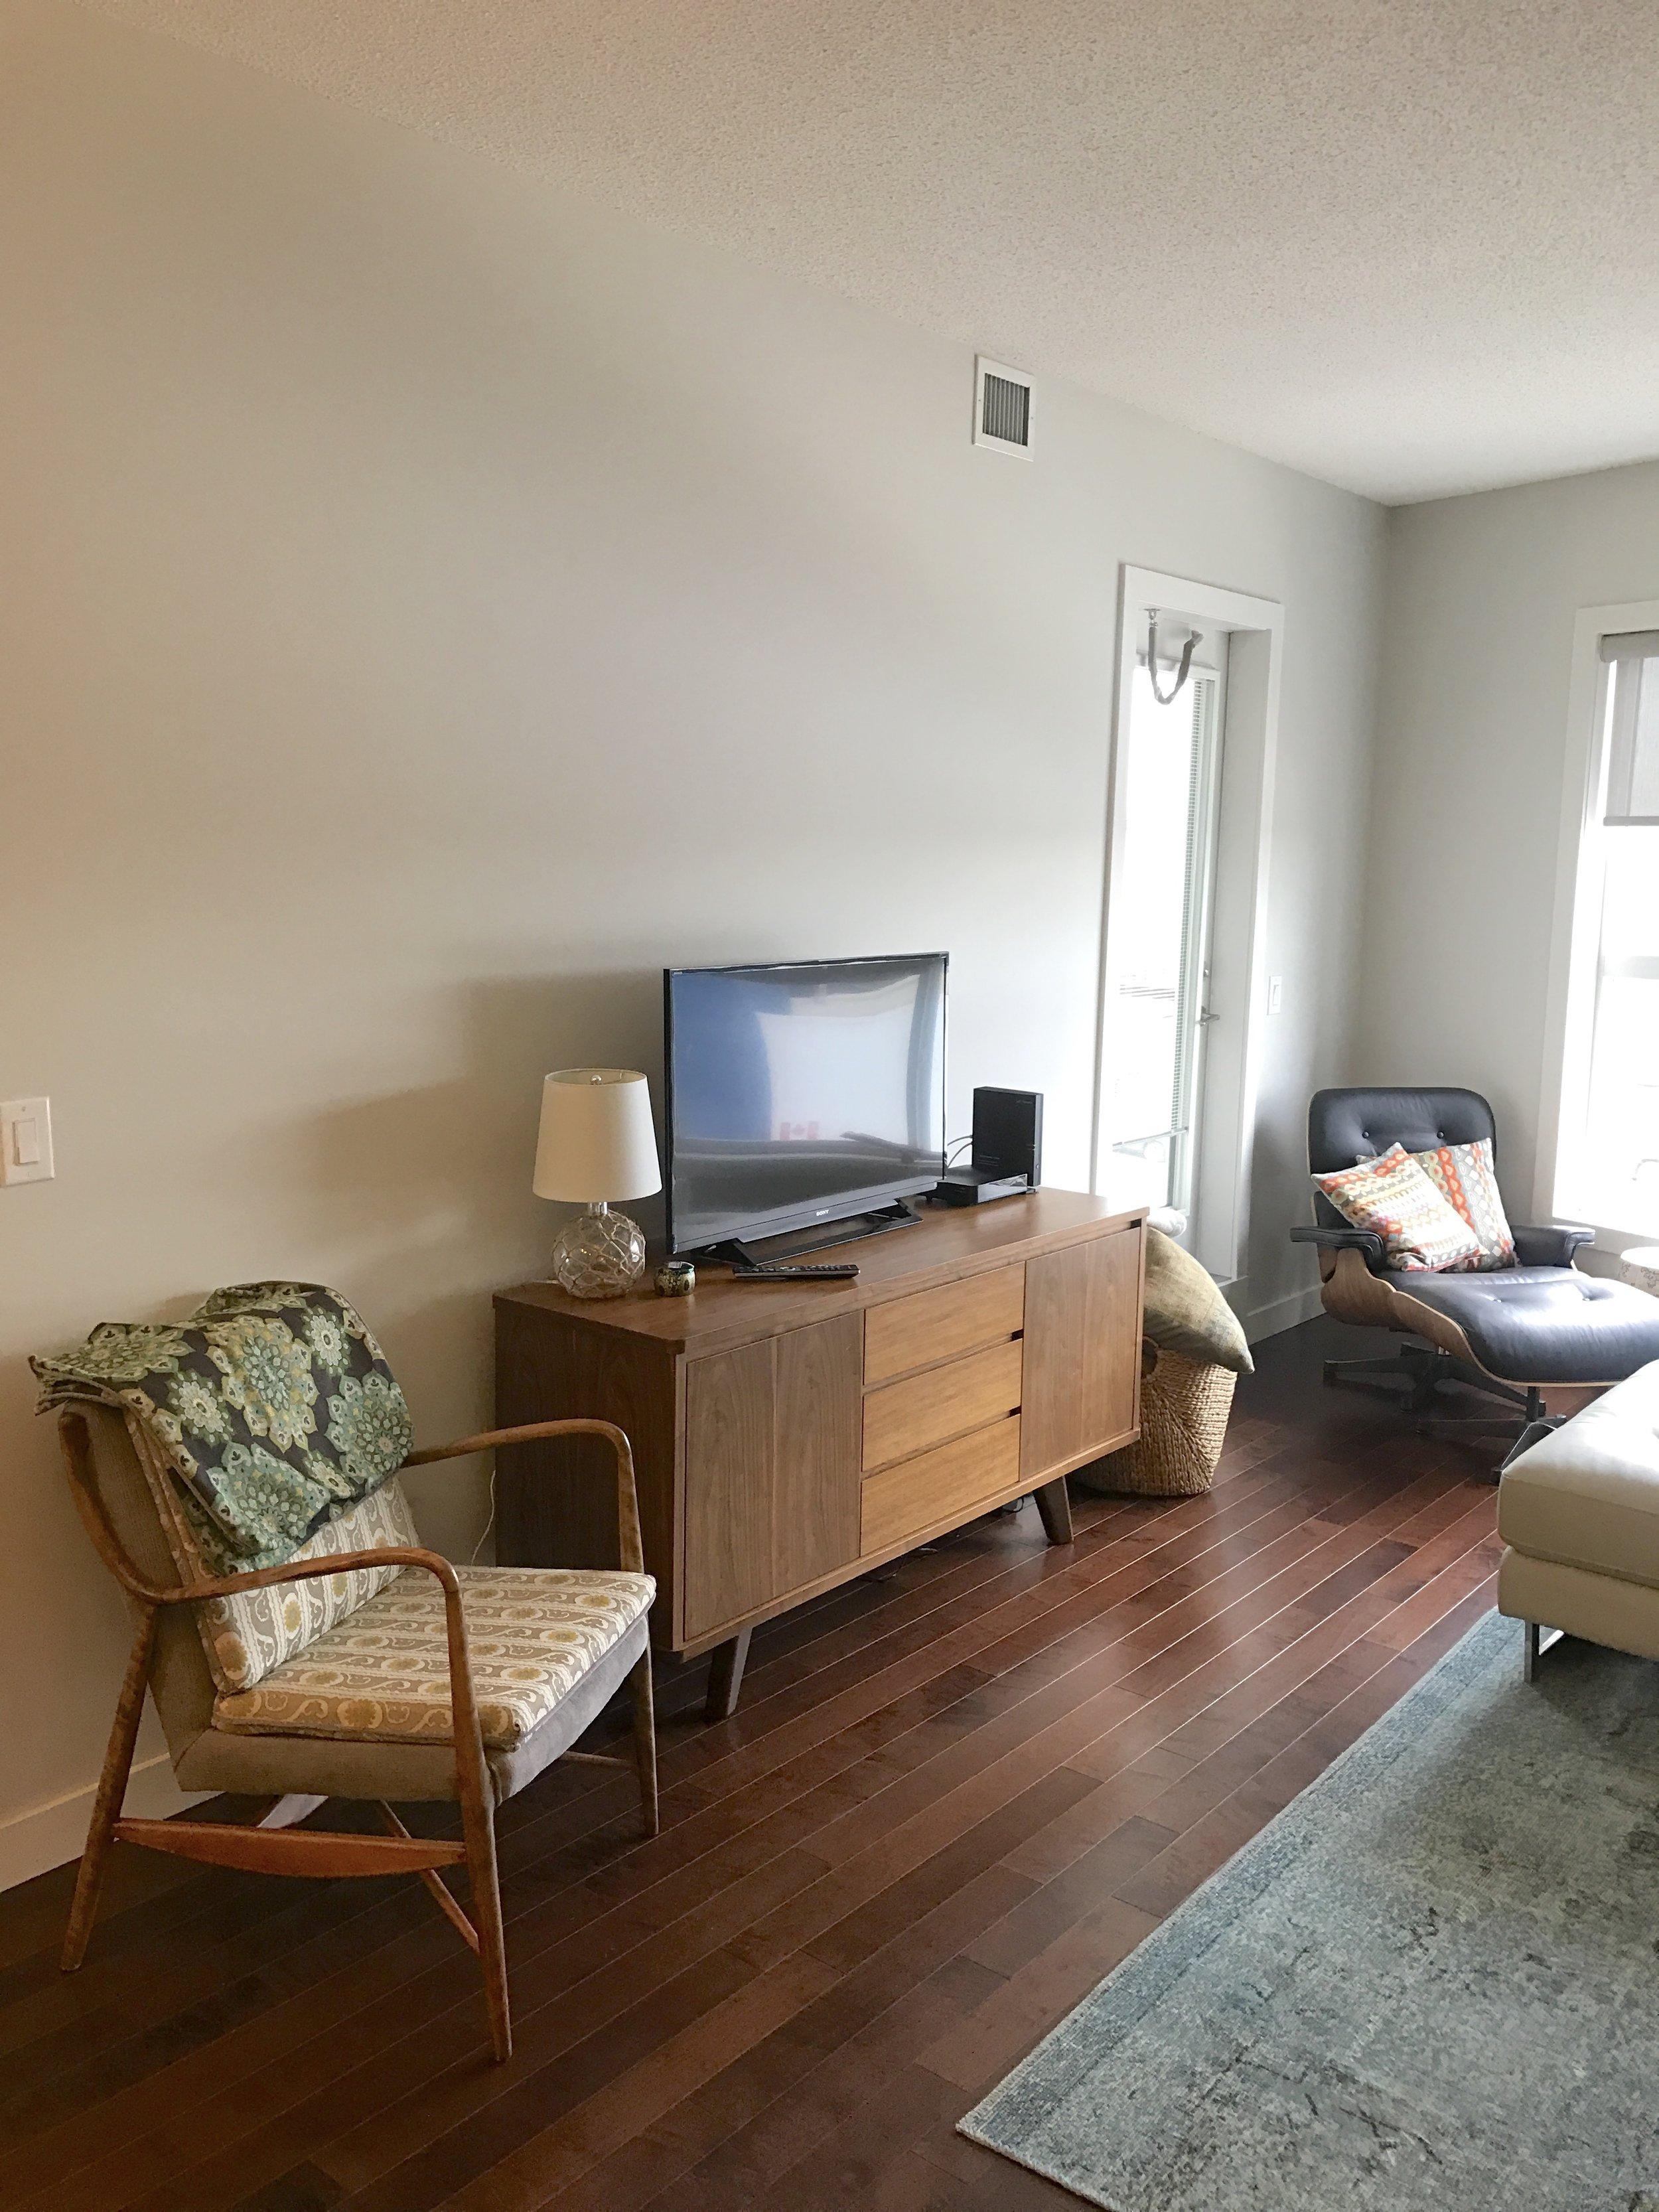 living room renovation before photo.JPG